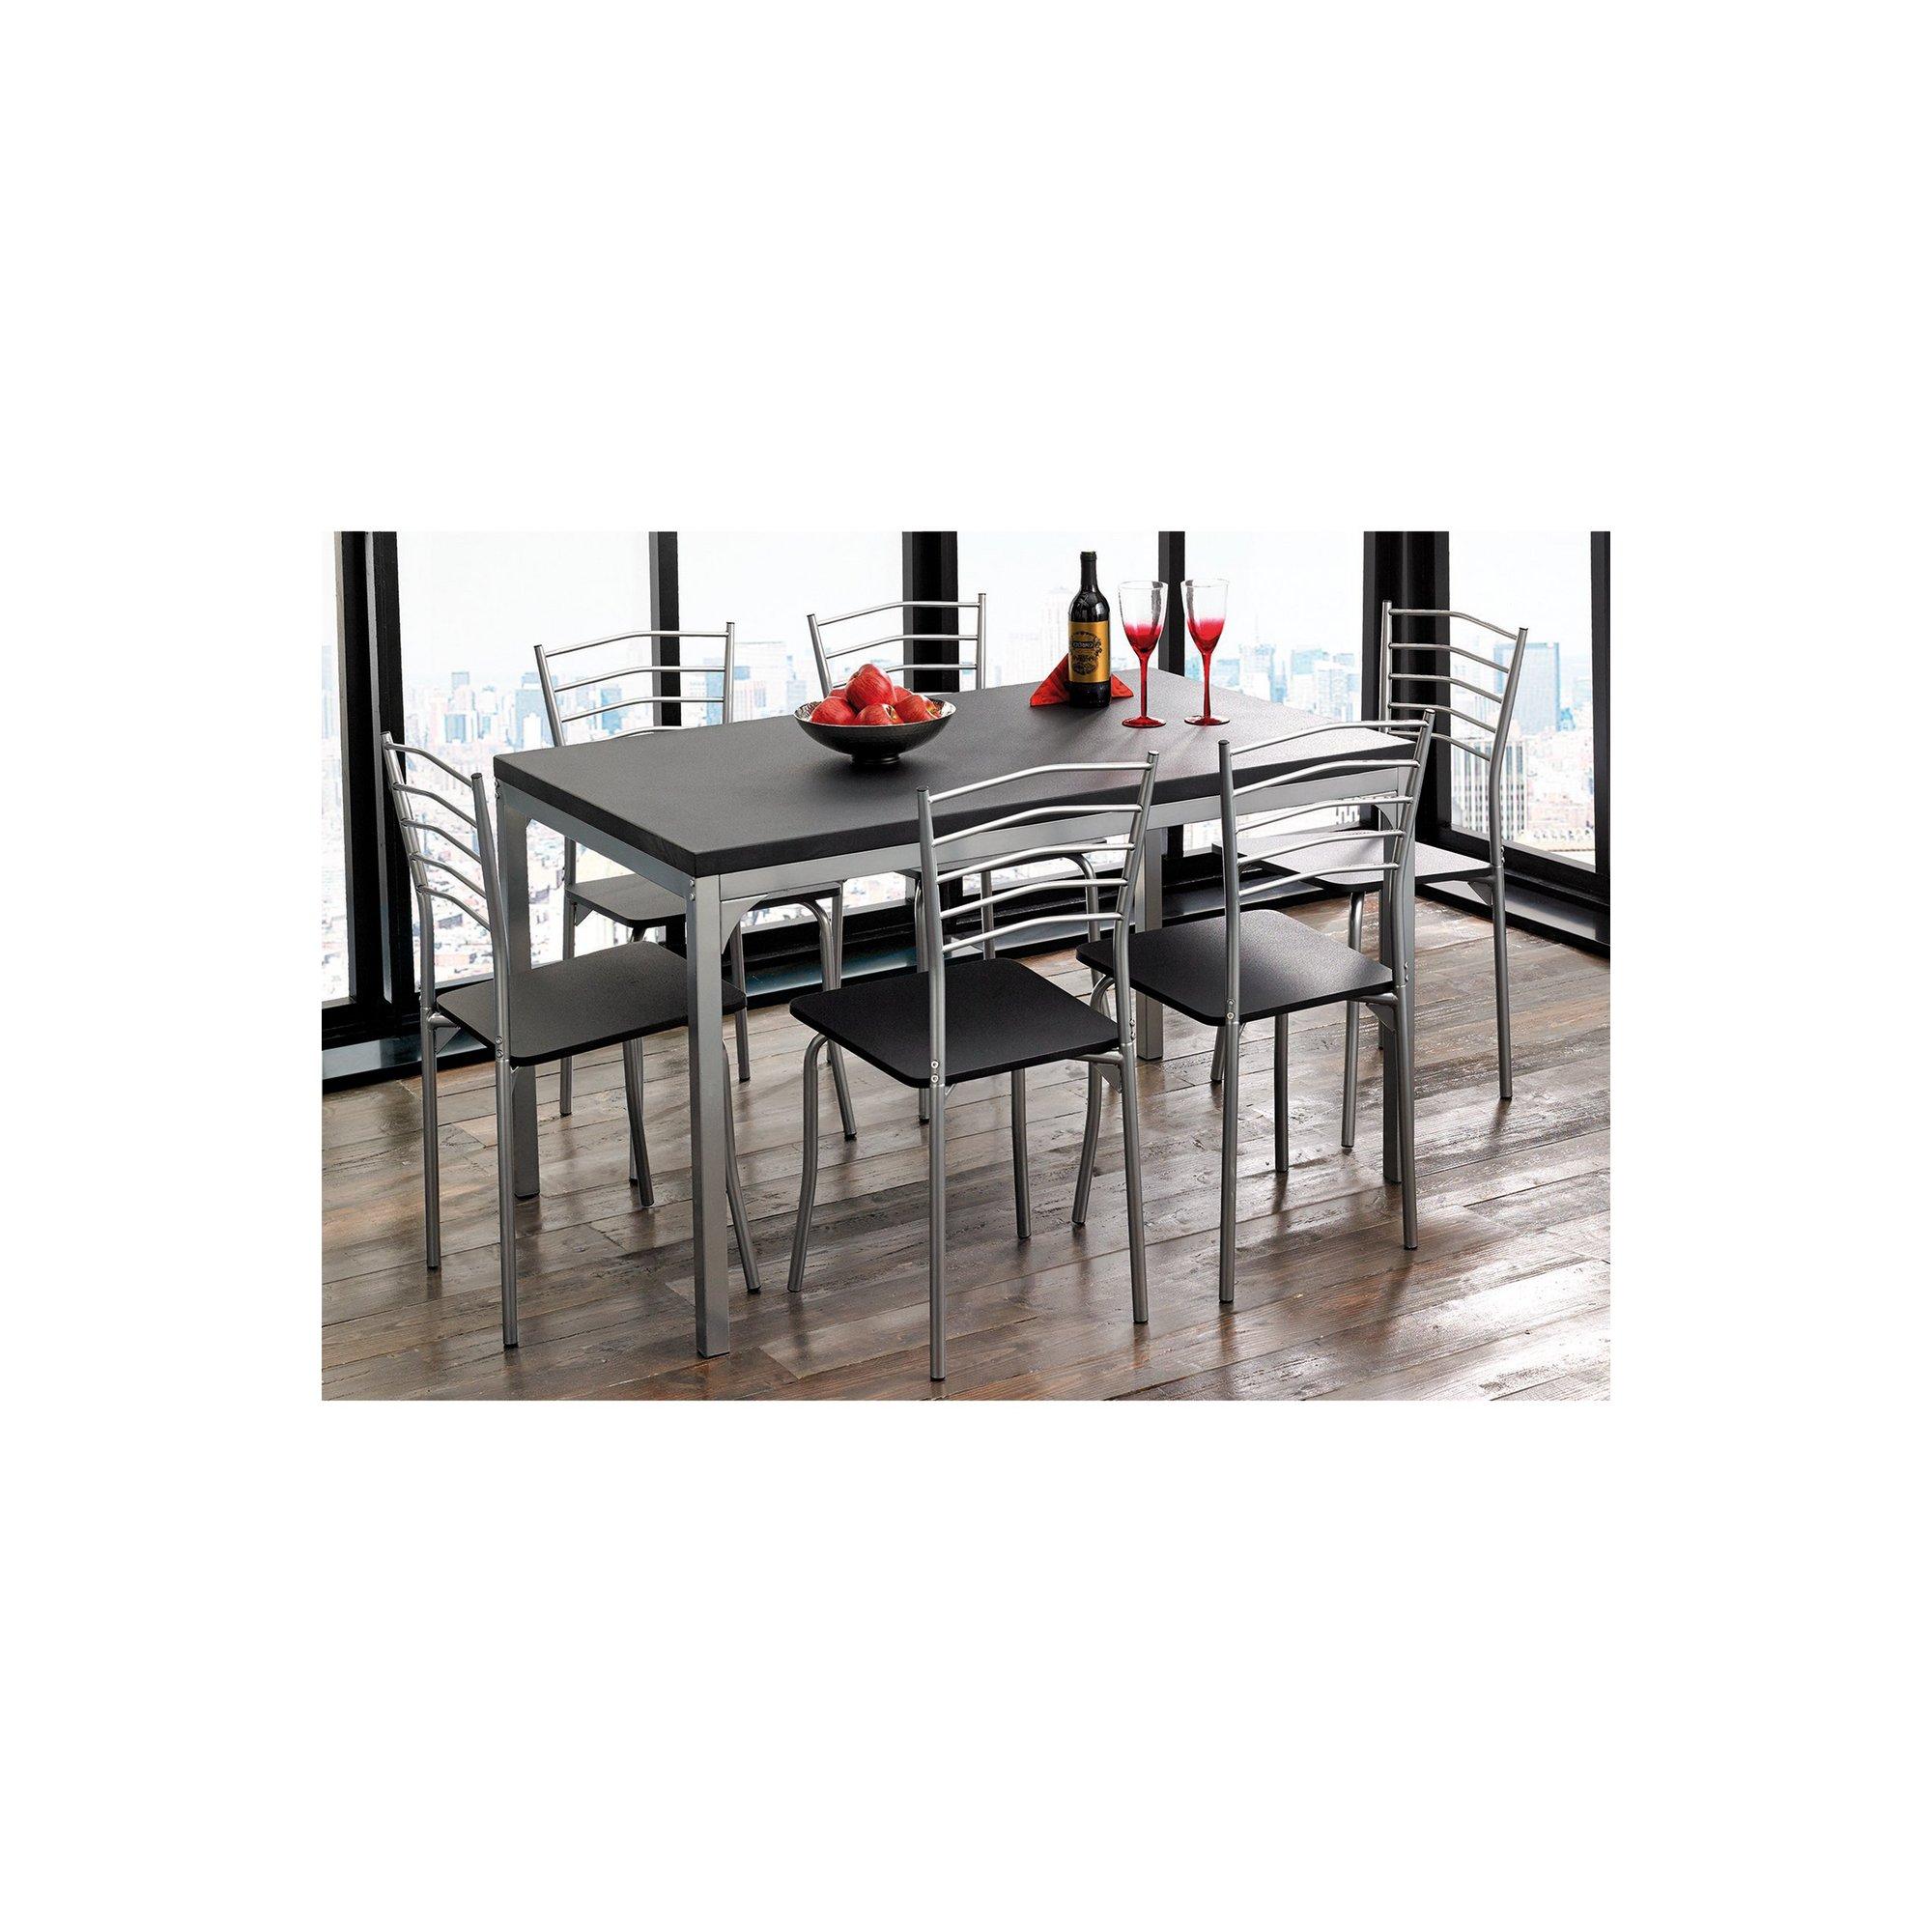 Image of 7-Piece Dining Set